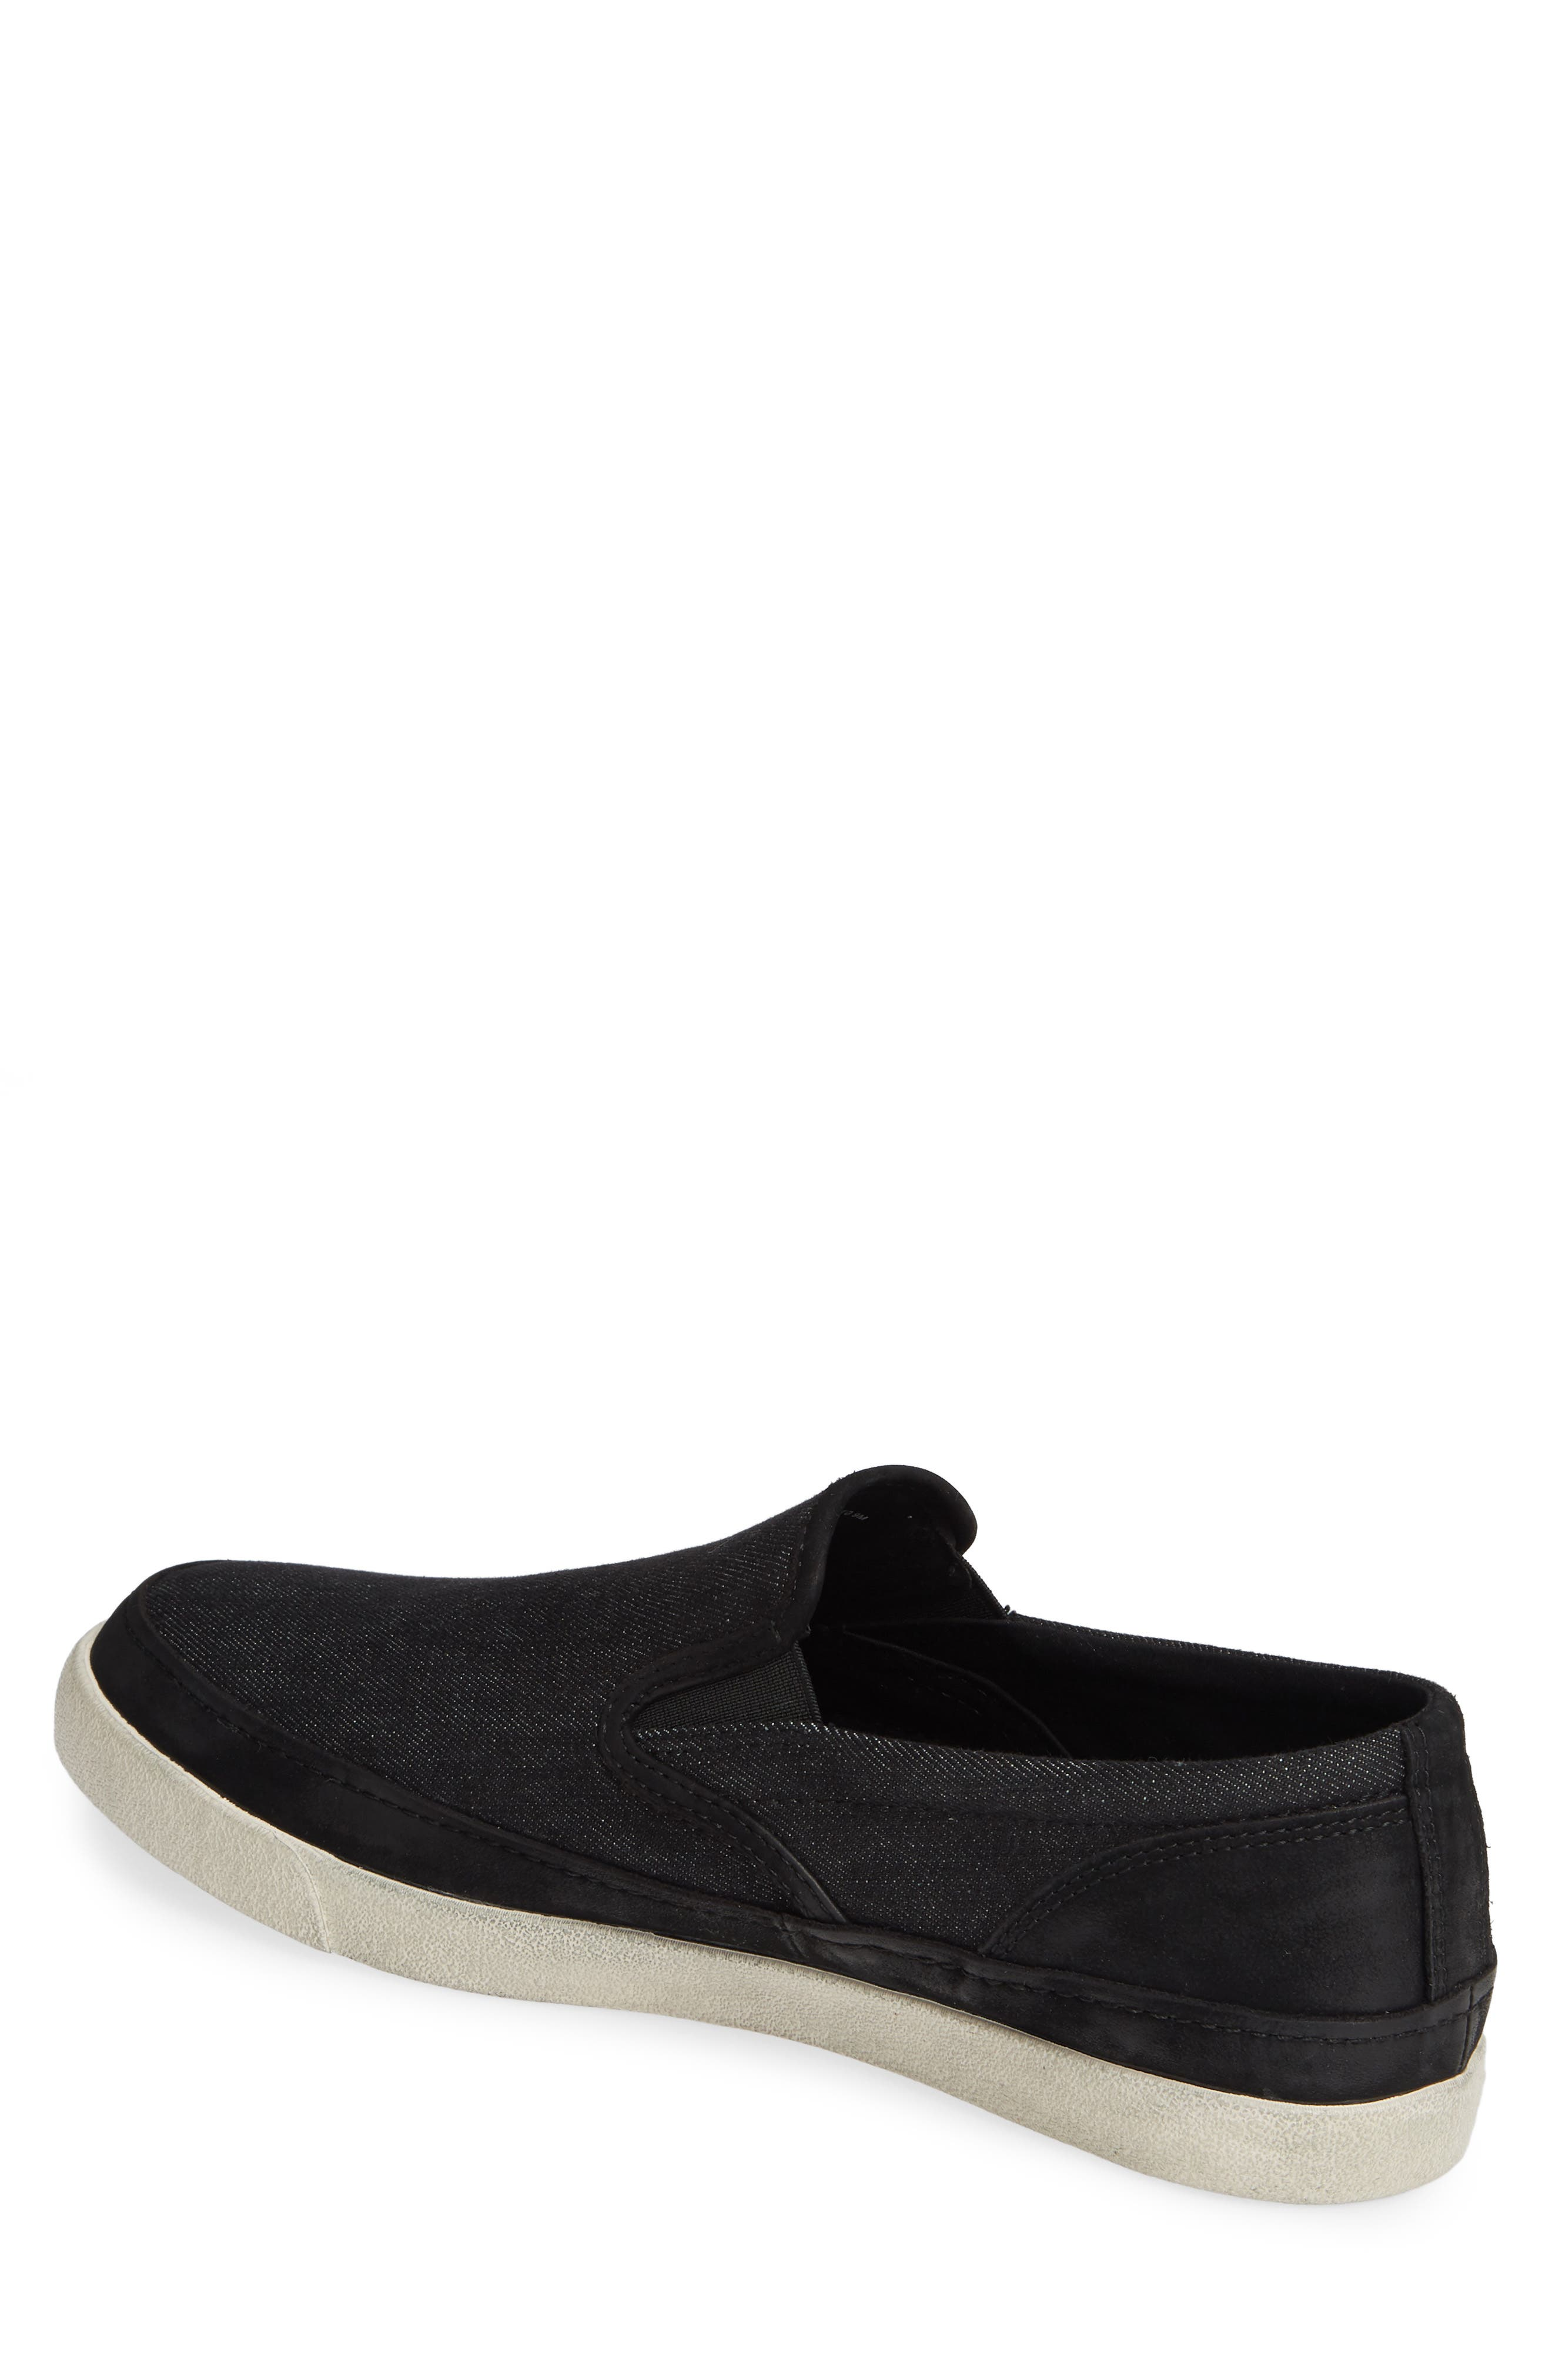 ,                             Jet Canvas Slip-On Sneaker,                             Alternate thumbnail 2, color,                             MINERAL BLK